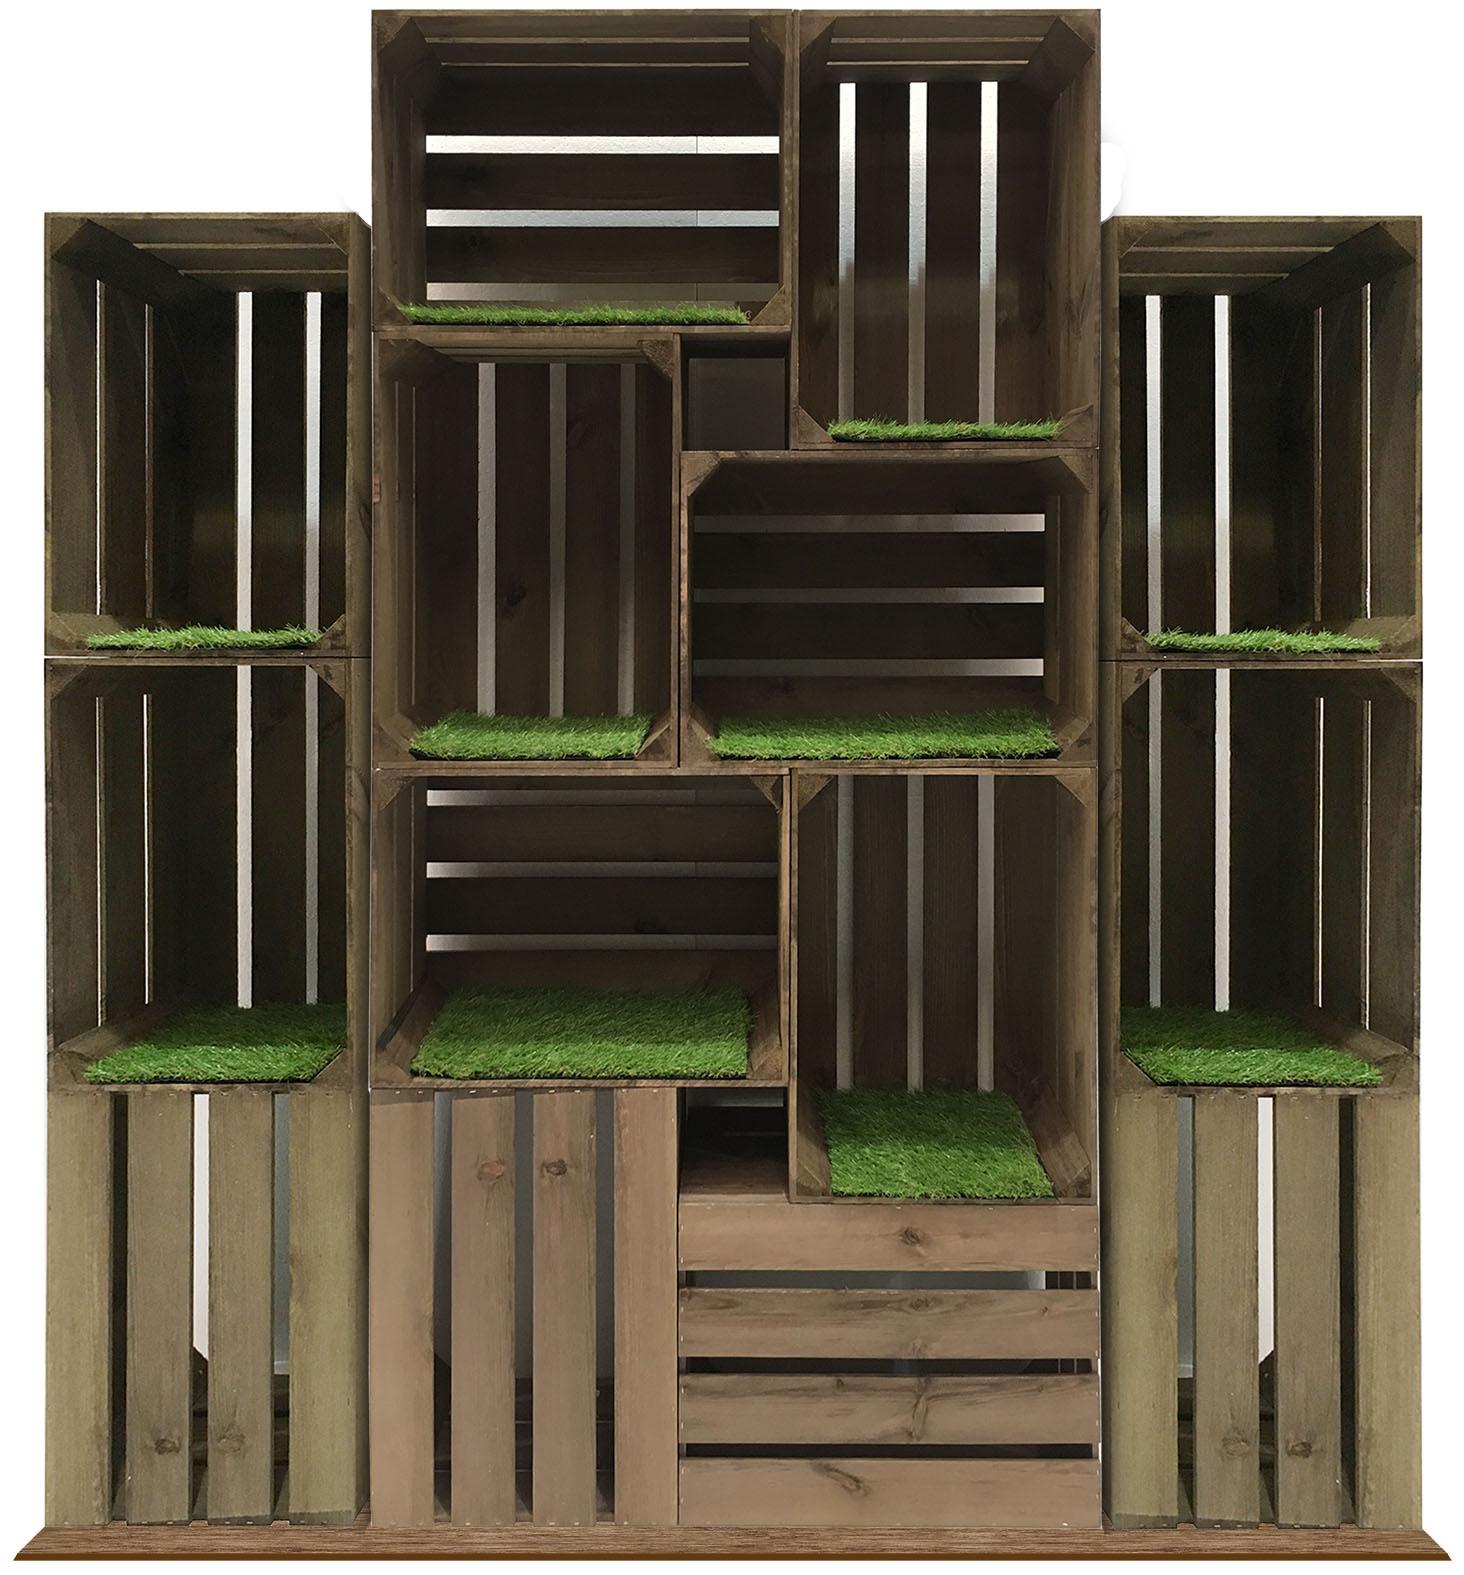 Rustic Crate Stands Artisan Merchandise Presentation